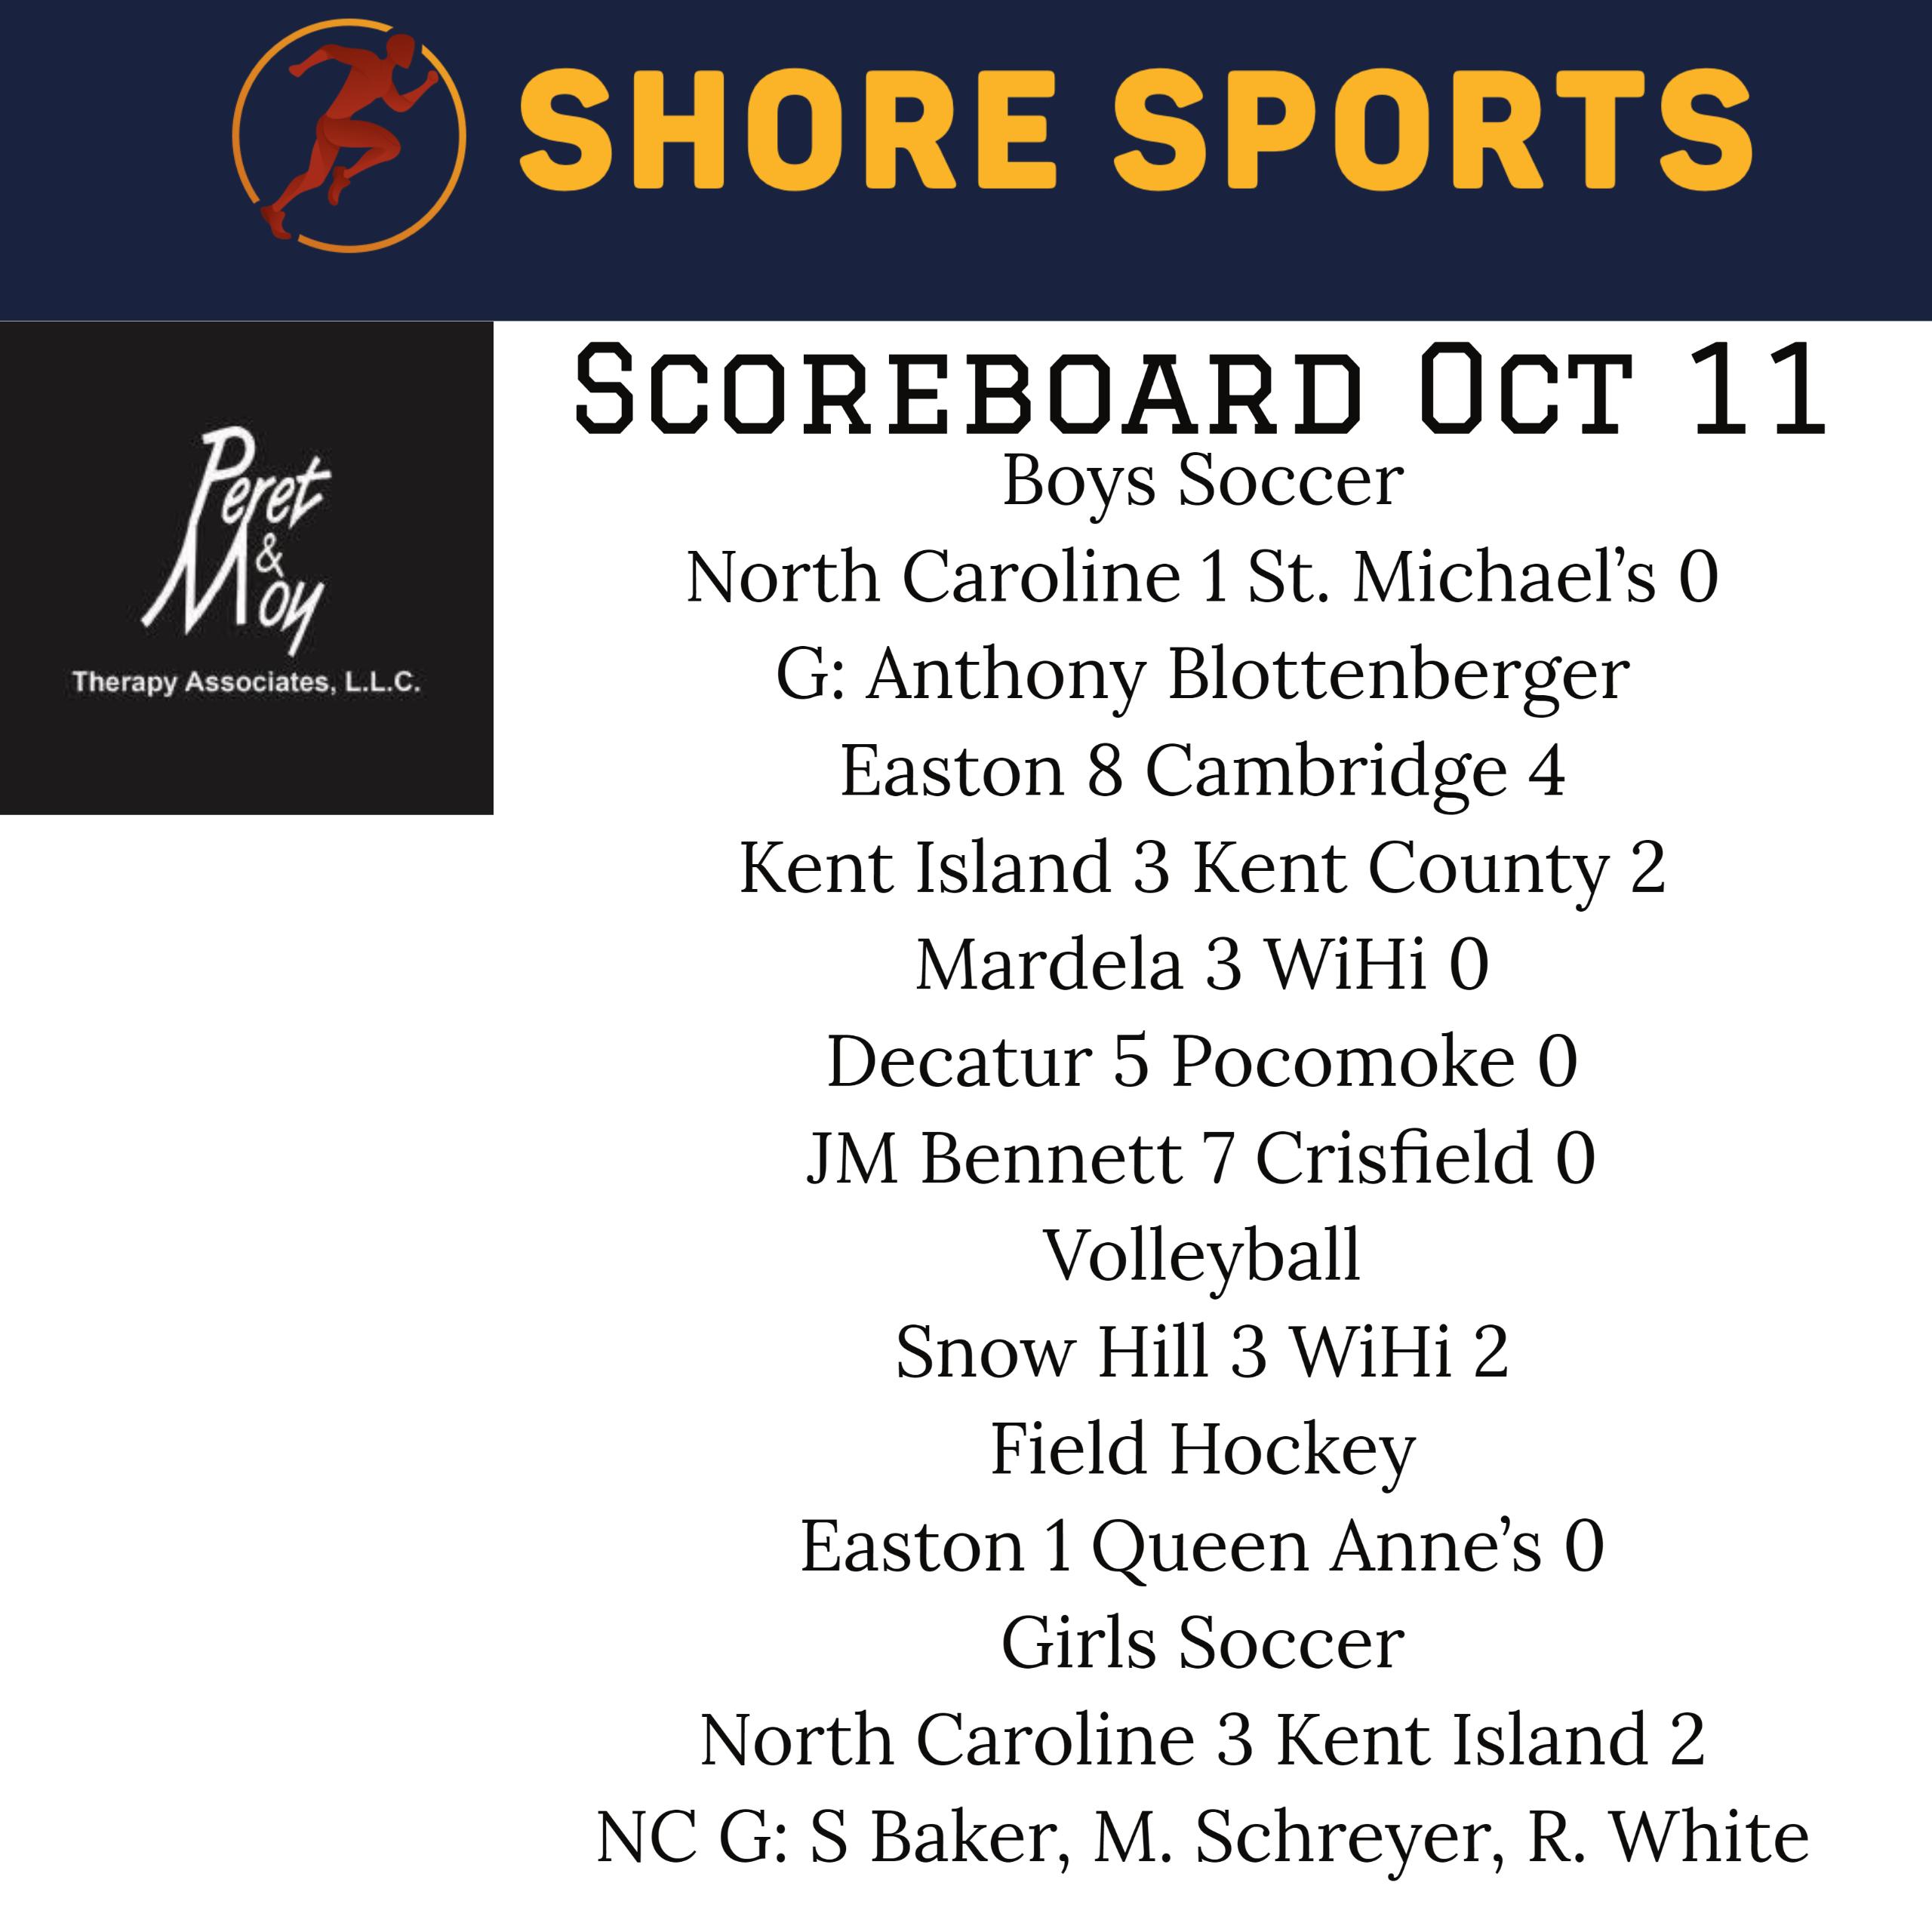 Scoreboard for Monday, October 11